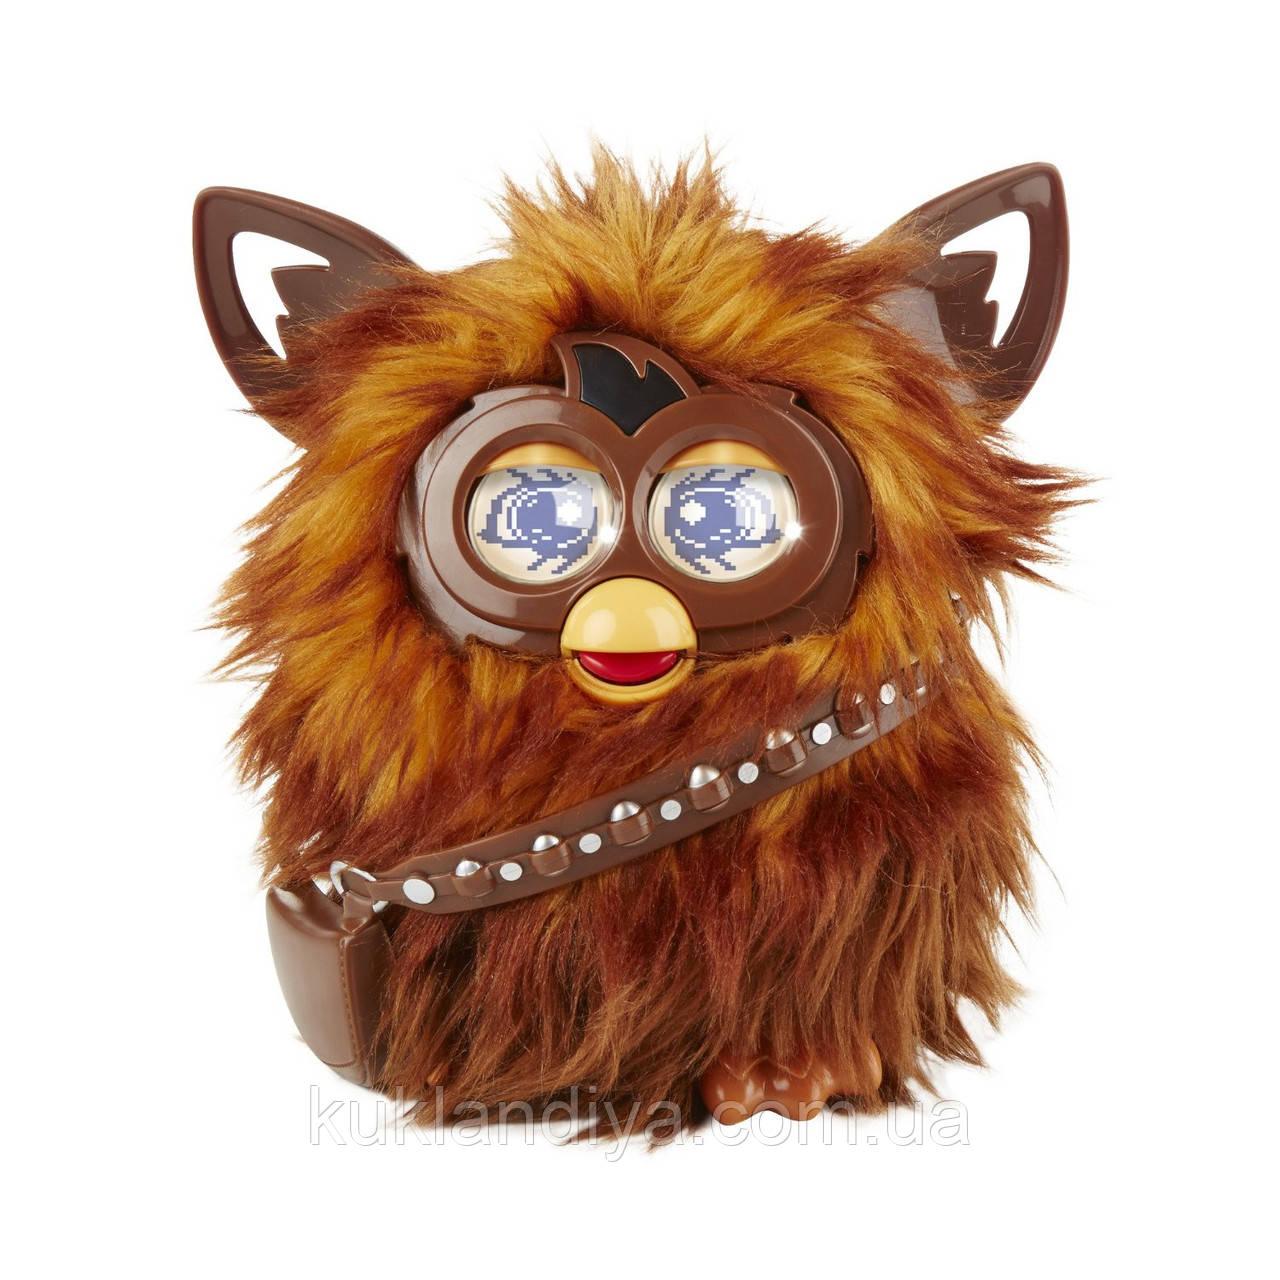 Фурбакка Ферби STAR WARS Furby Furbacca